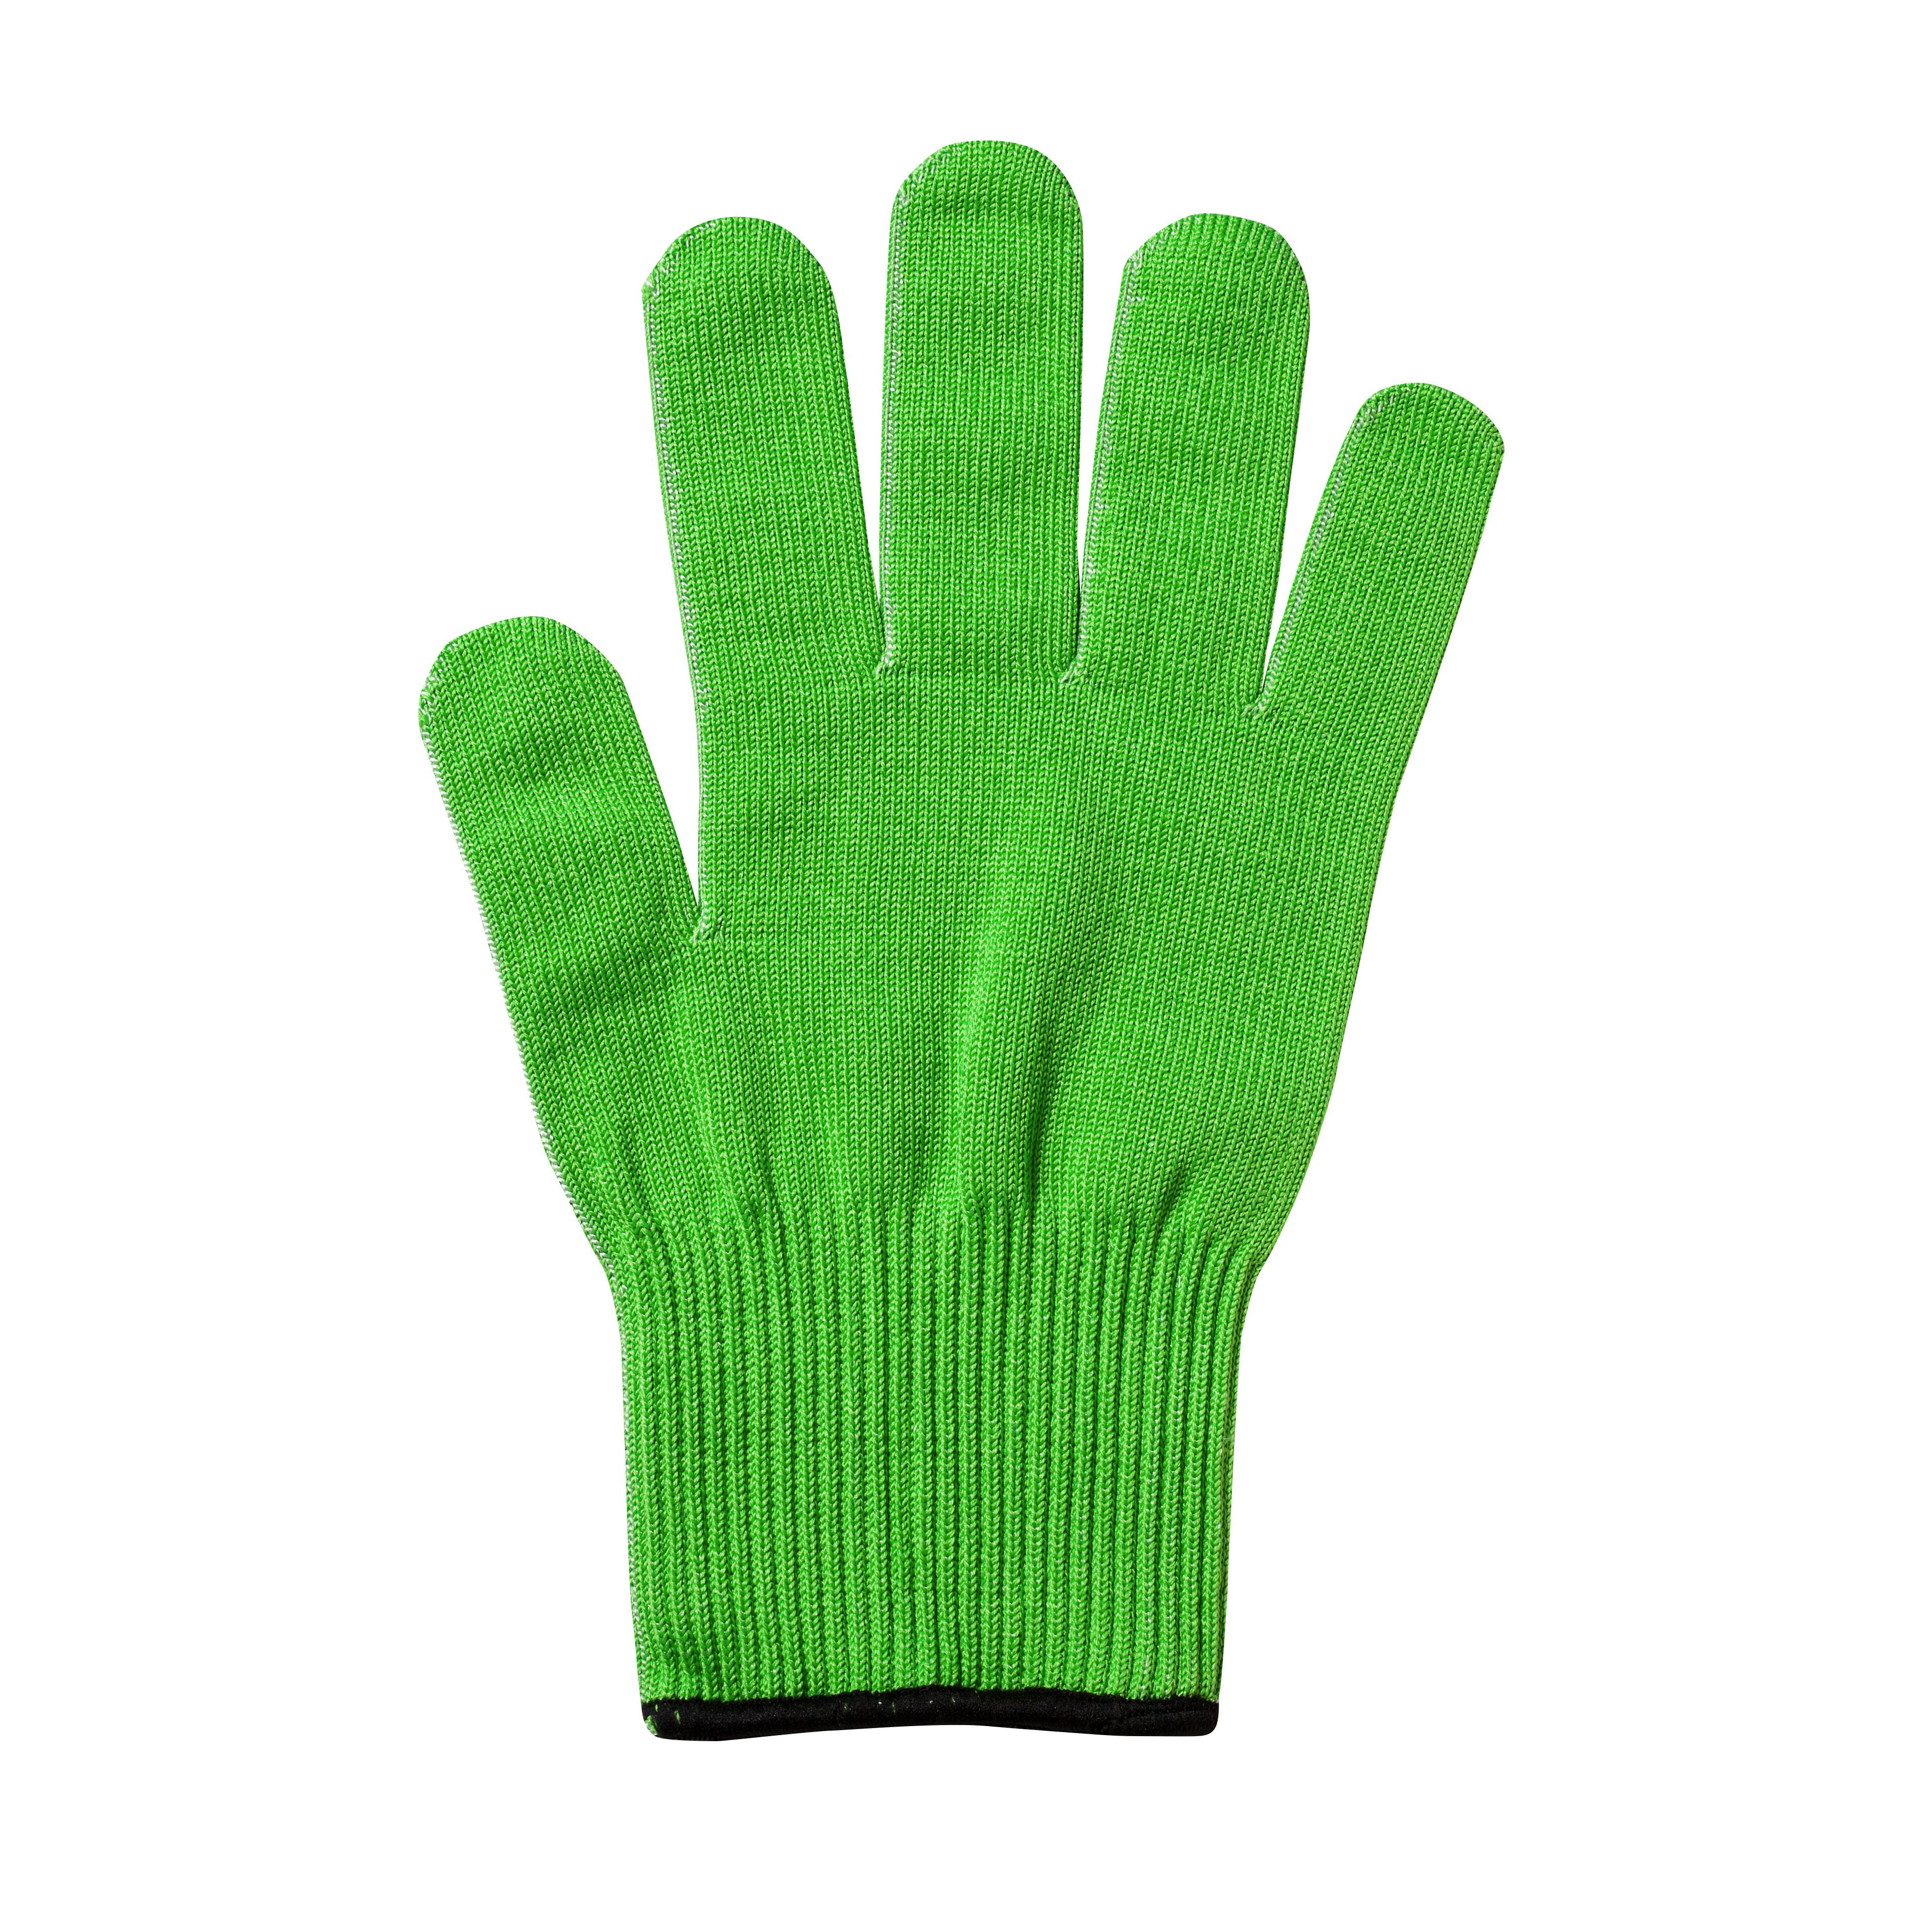 Mercer Culinary M33415GRM glove, cut resistant